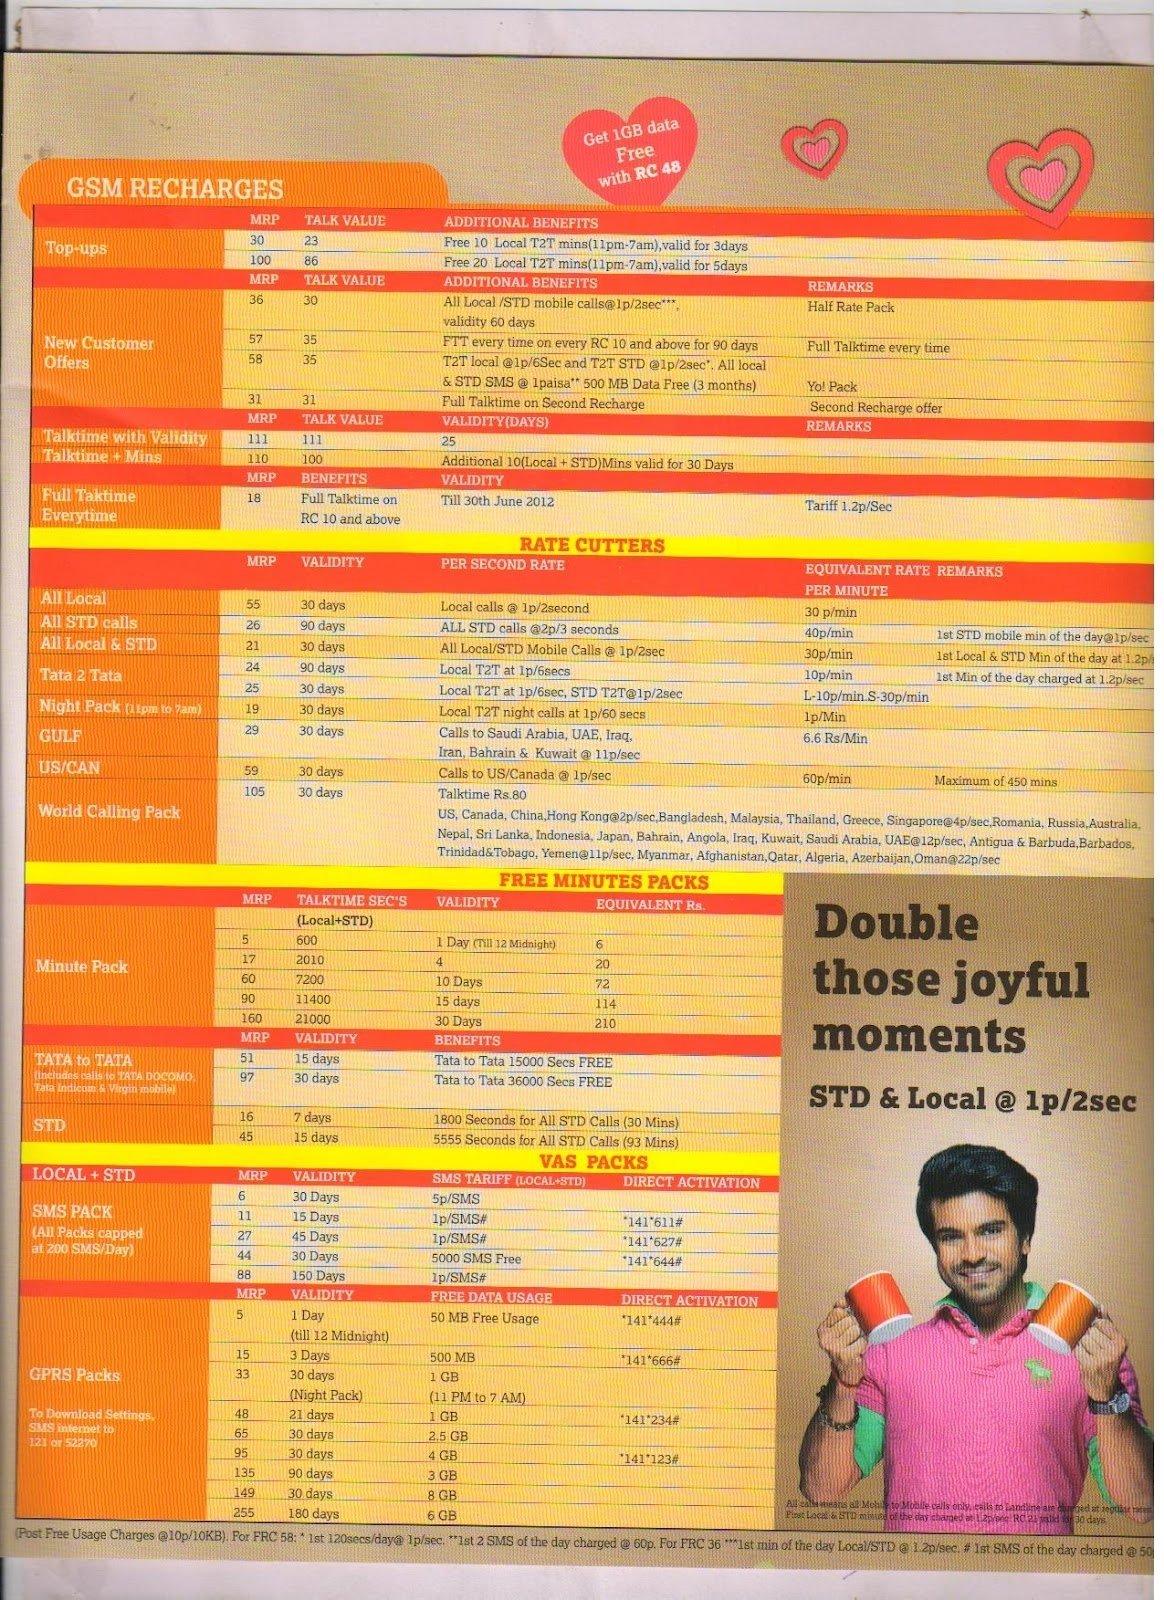 10 Stunning Idea Online Recharge Andhra Pradesh recharge tariff andhra pradesh india telicom 2012 world social news 1